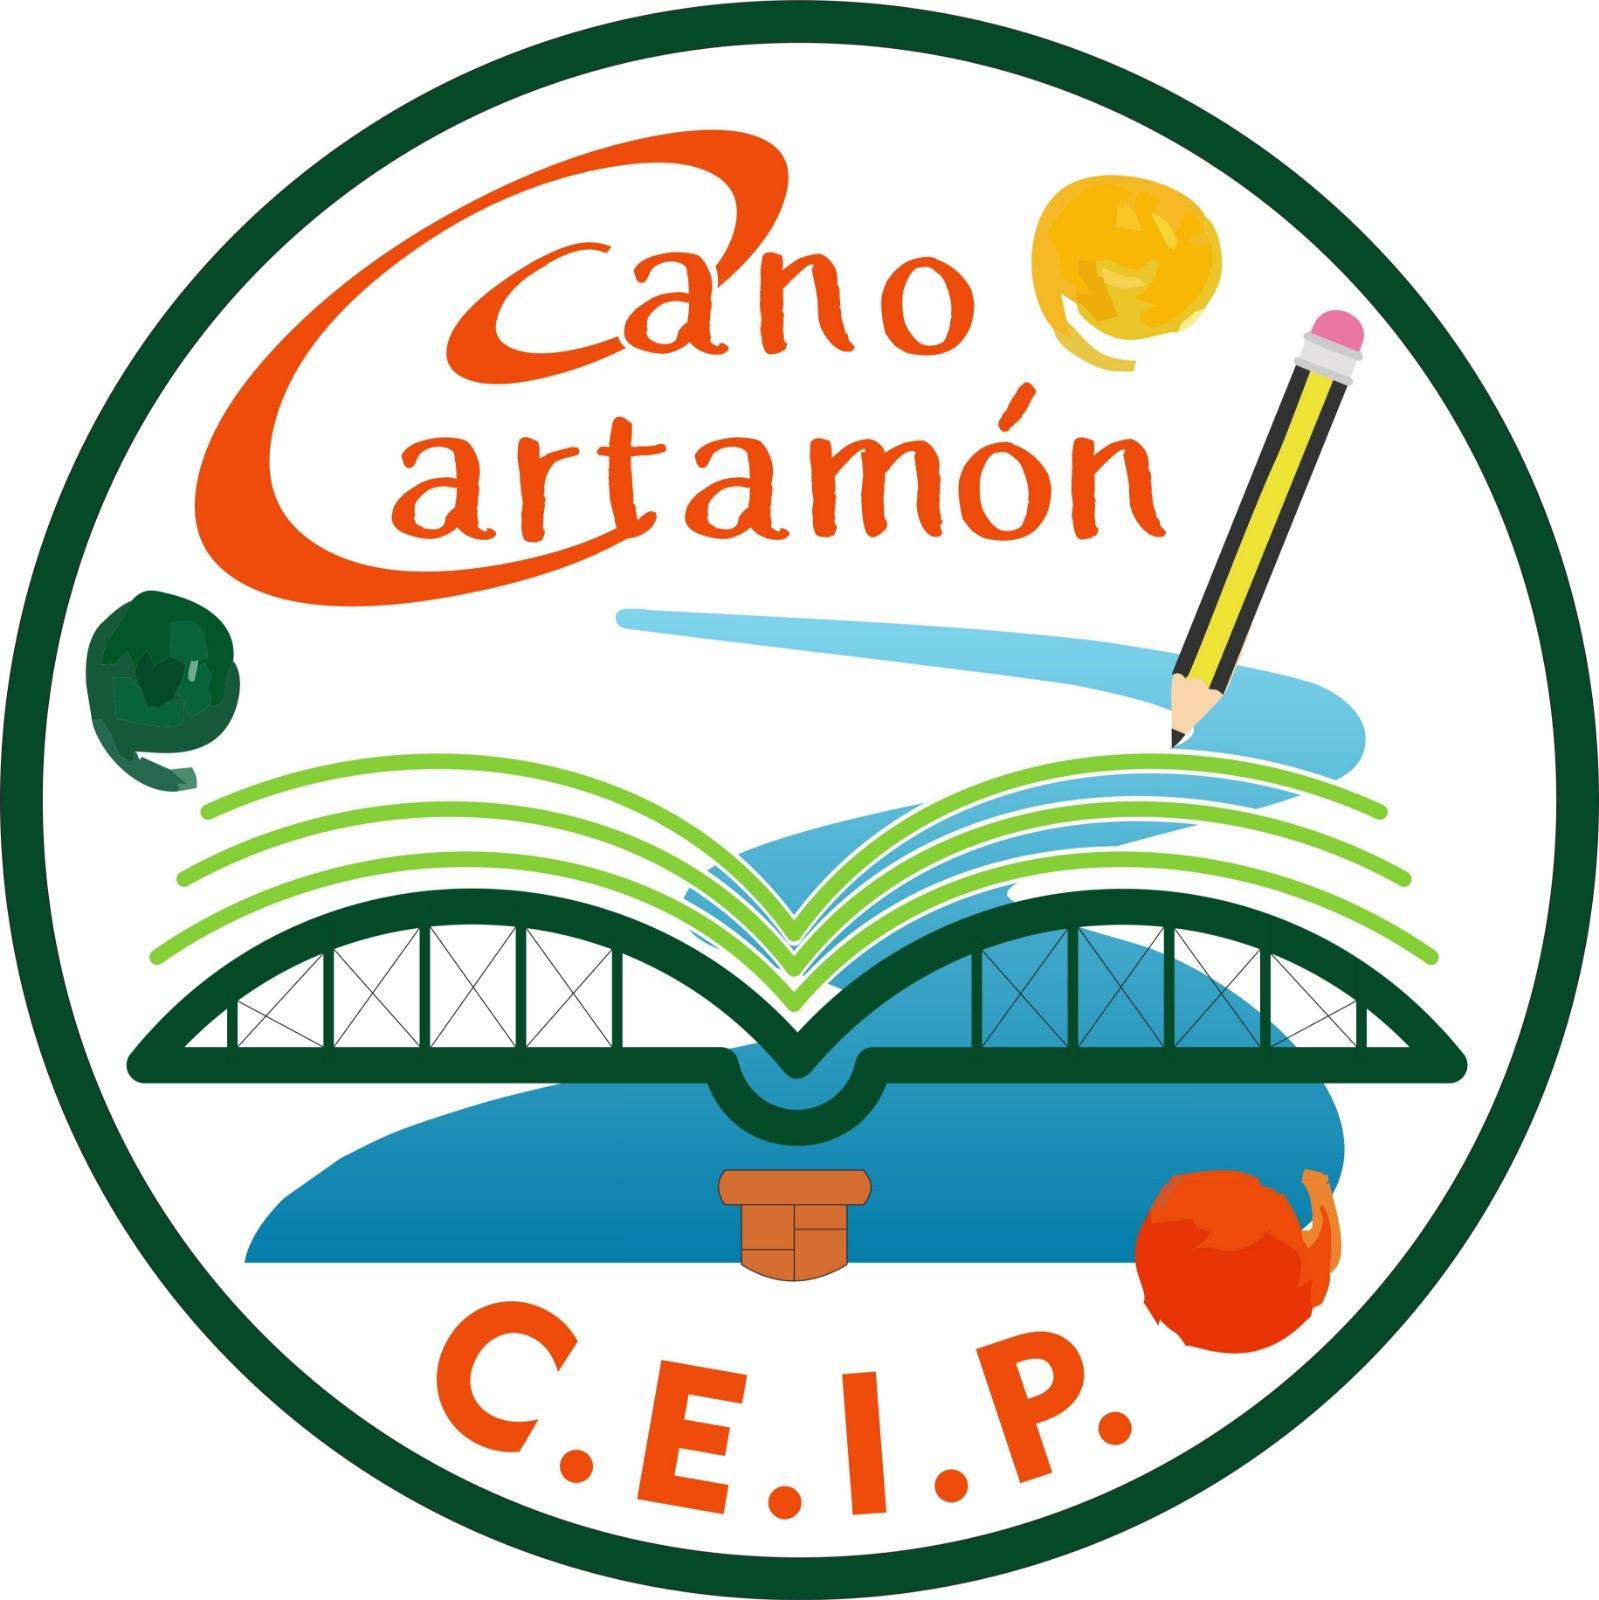 ceipcanocartamon.com